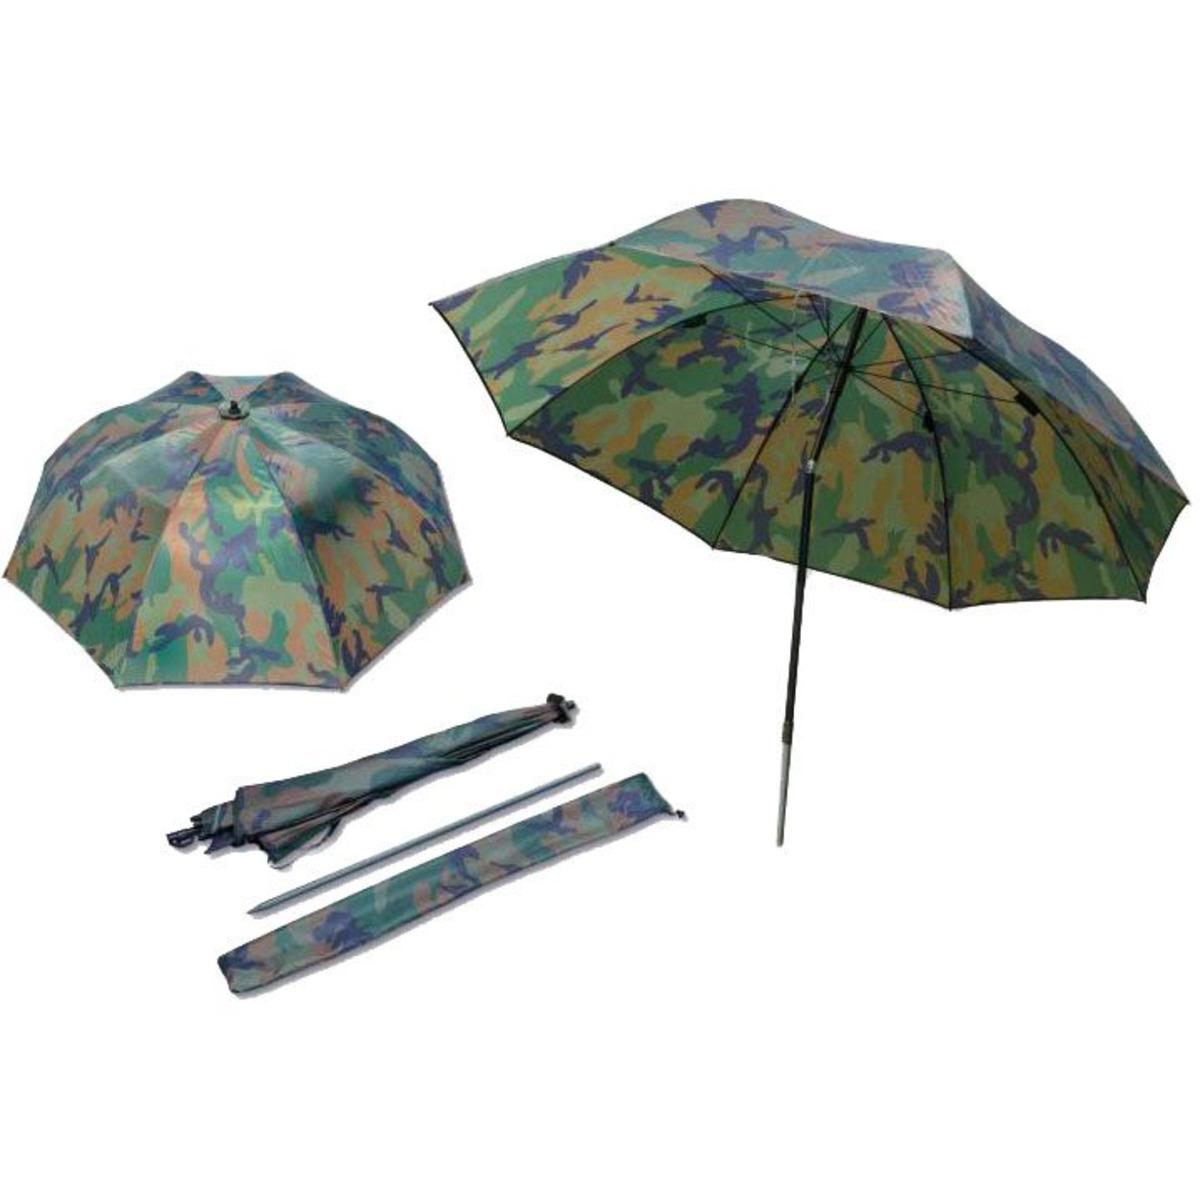 Zebco Nylon Camou Umbrella - 2.20 m